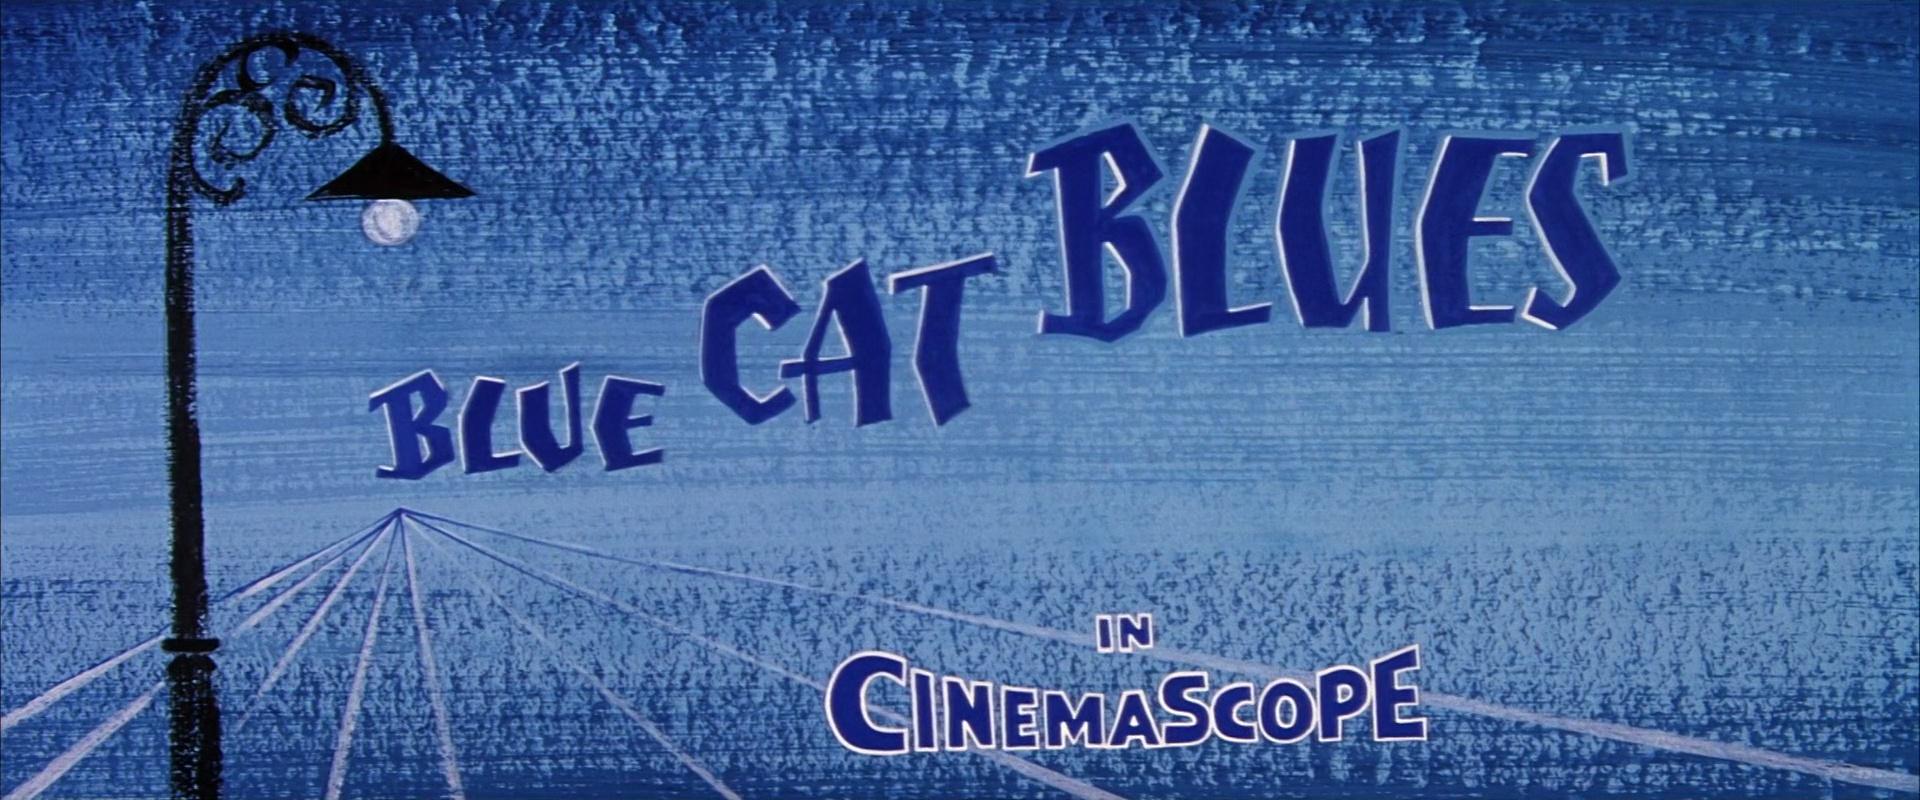 Blue Cat Blues title.JPG